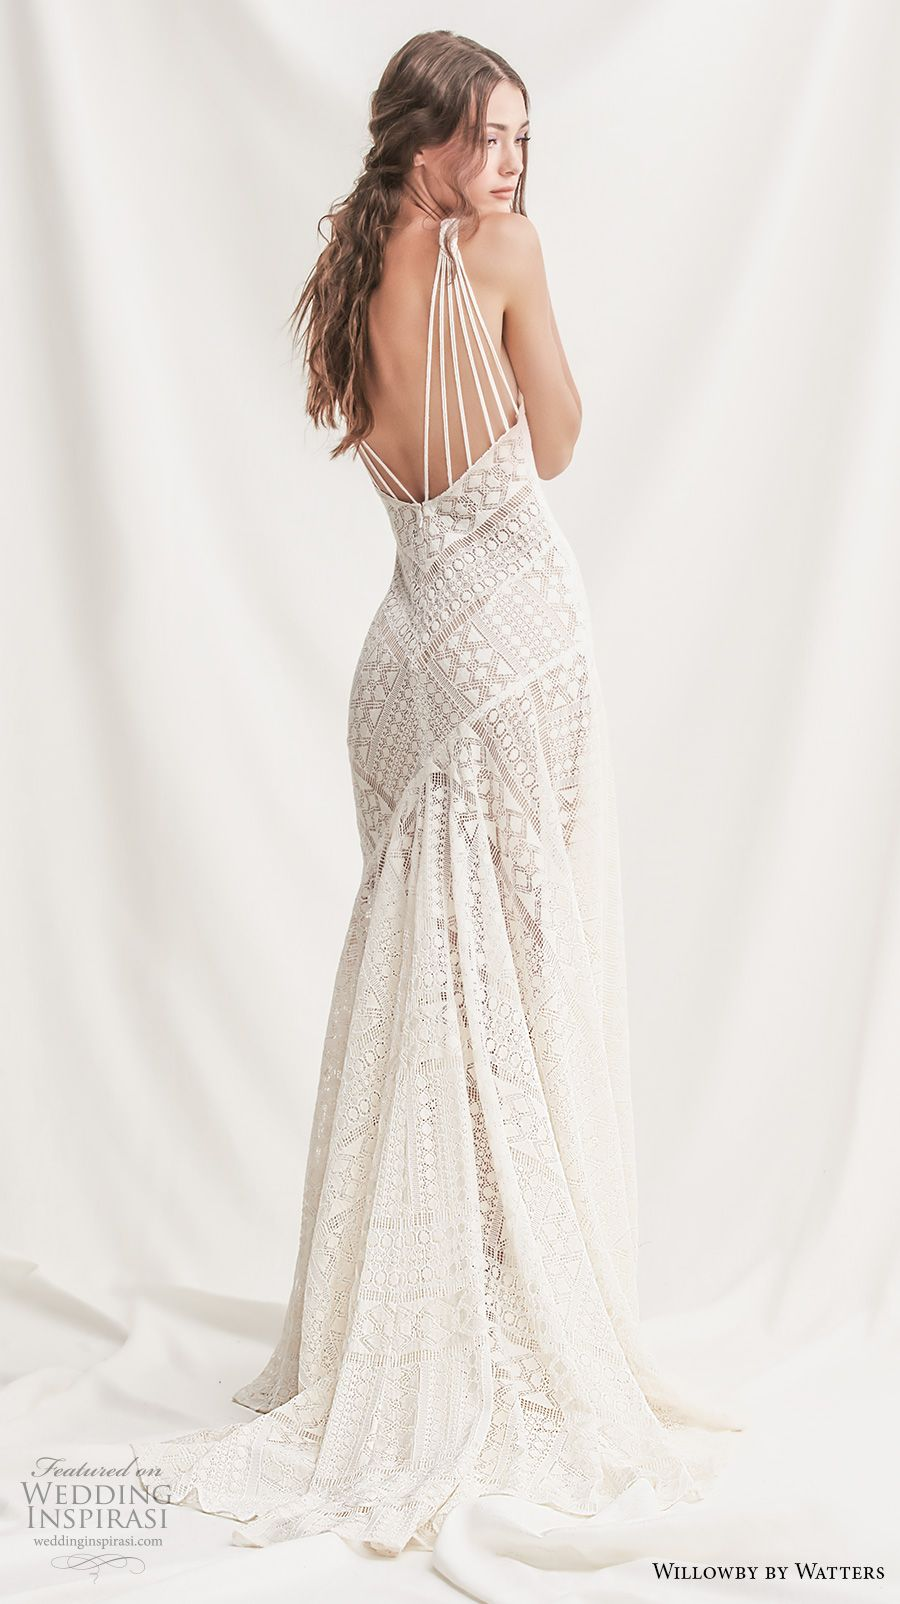 Willowby By Watters Spring 2019 Wedding Dresses Wedding Inspirasi Wedding Dresses Wedding Dresses Lace Sheath Wedding Dress